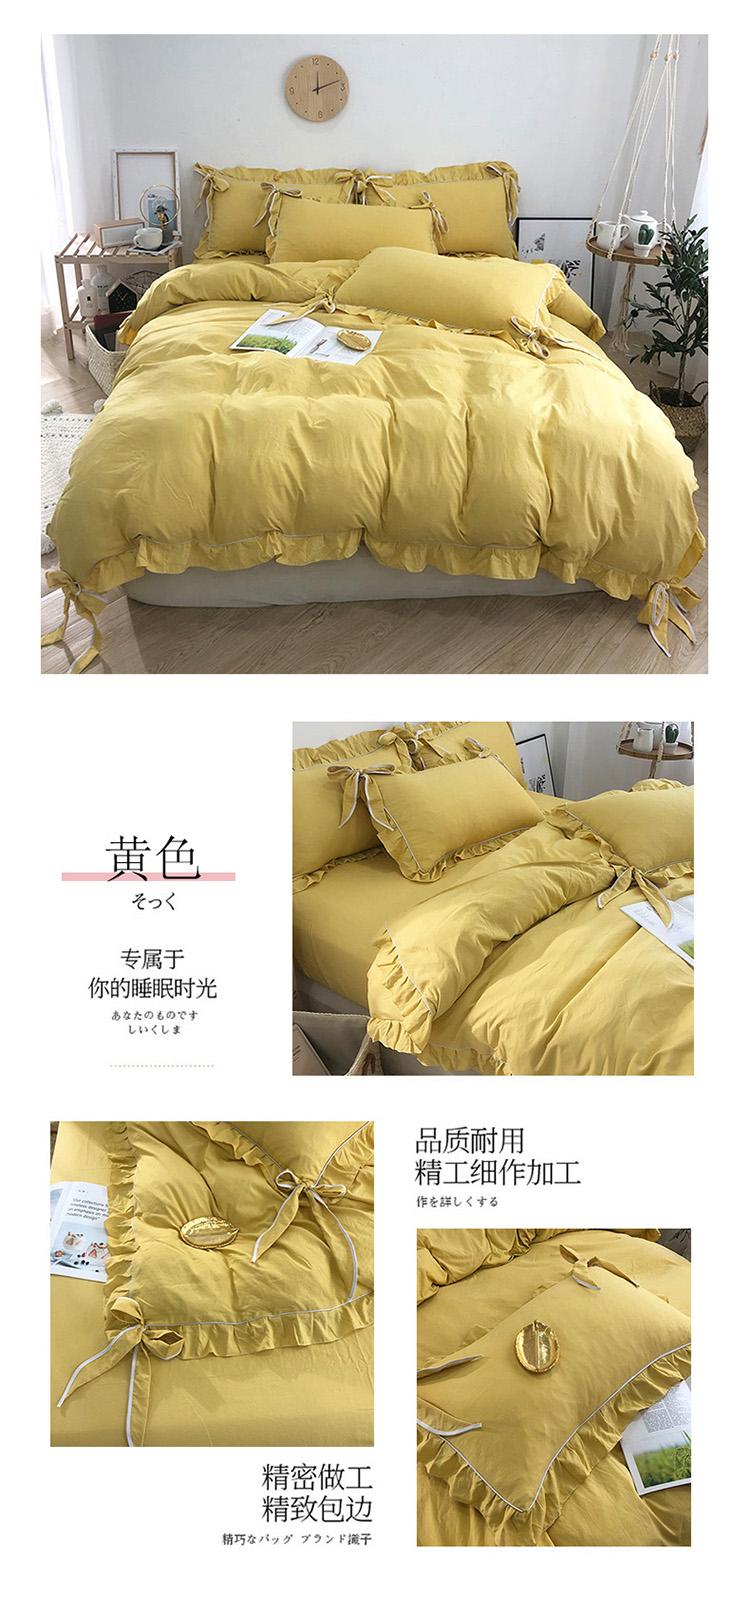 分类_黄色.jpg